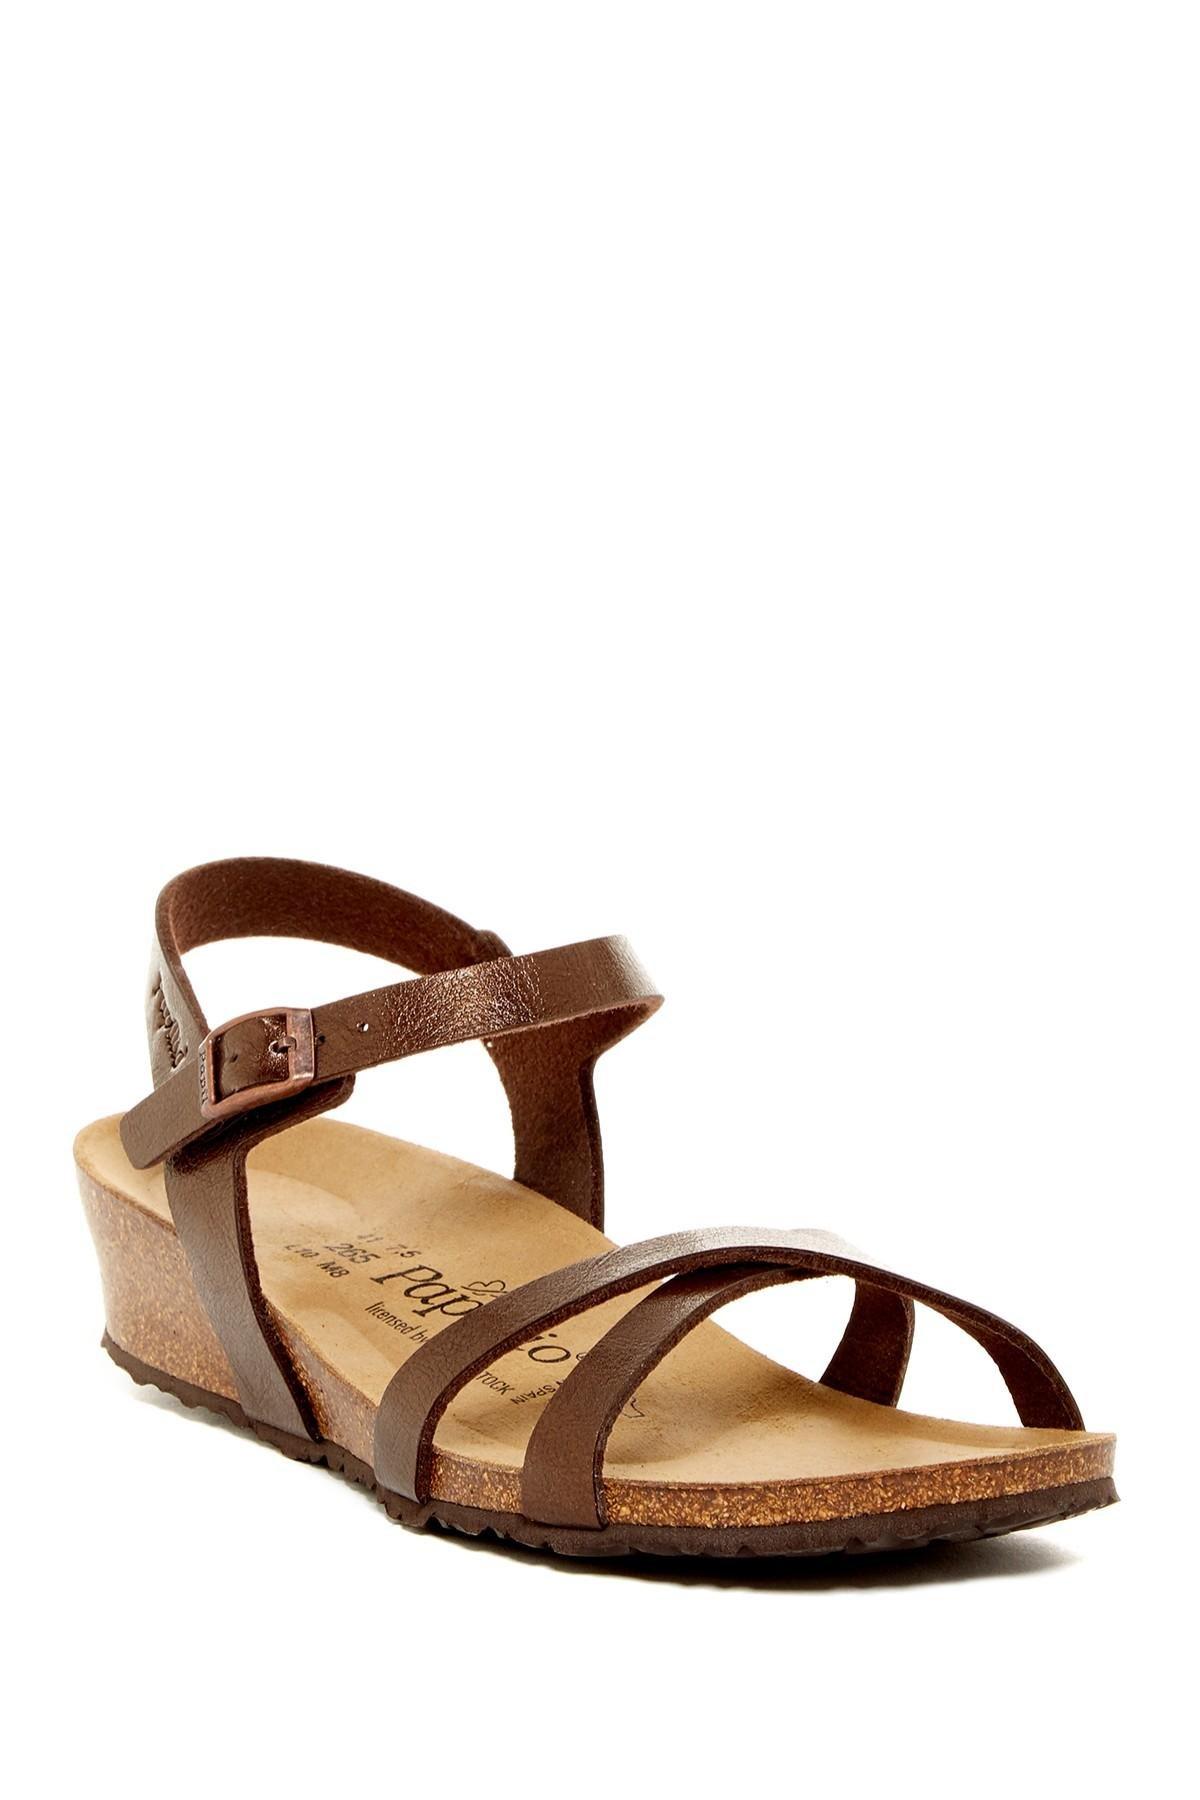 Lyst Birkenstock Alyssa Wedge Sandal Discontinued In Brown